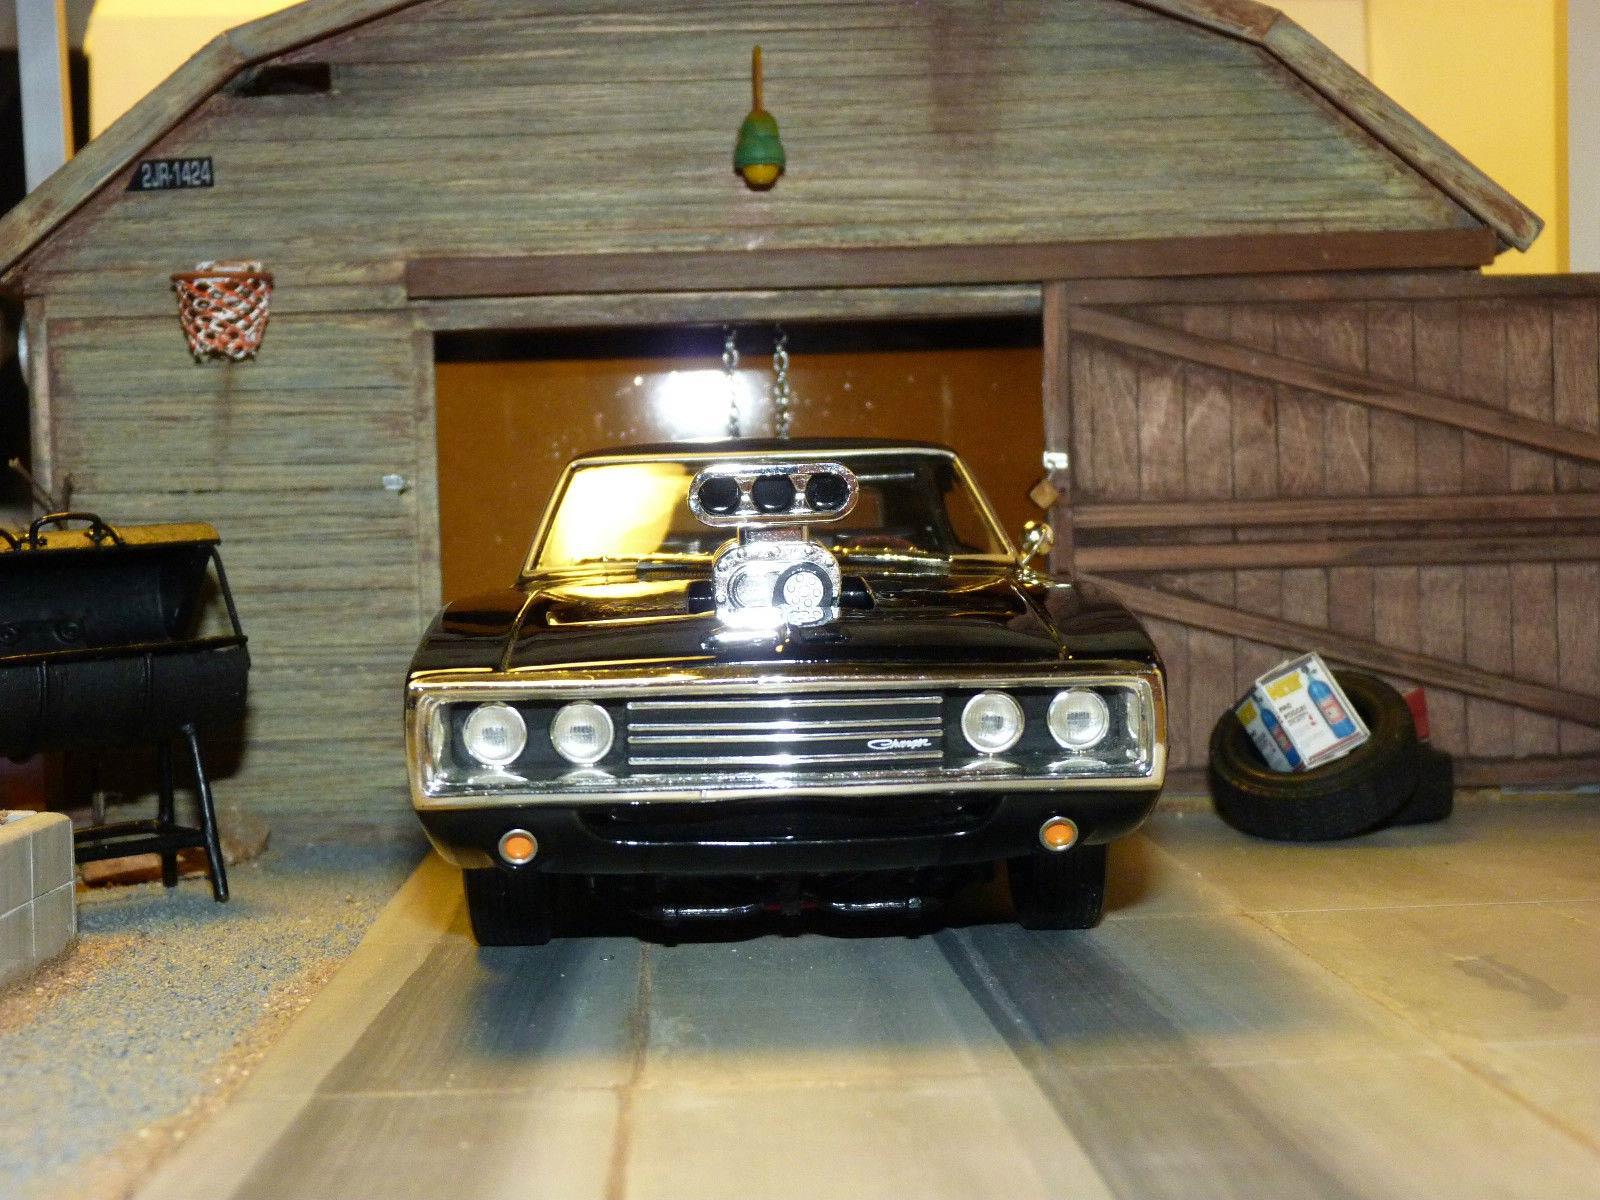 Diorama garage 1/18 de la Dodge Charger de Fast Furious